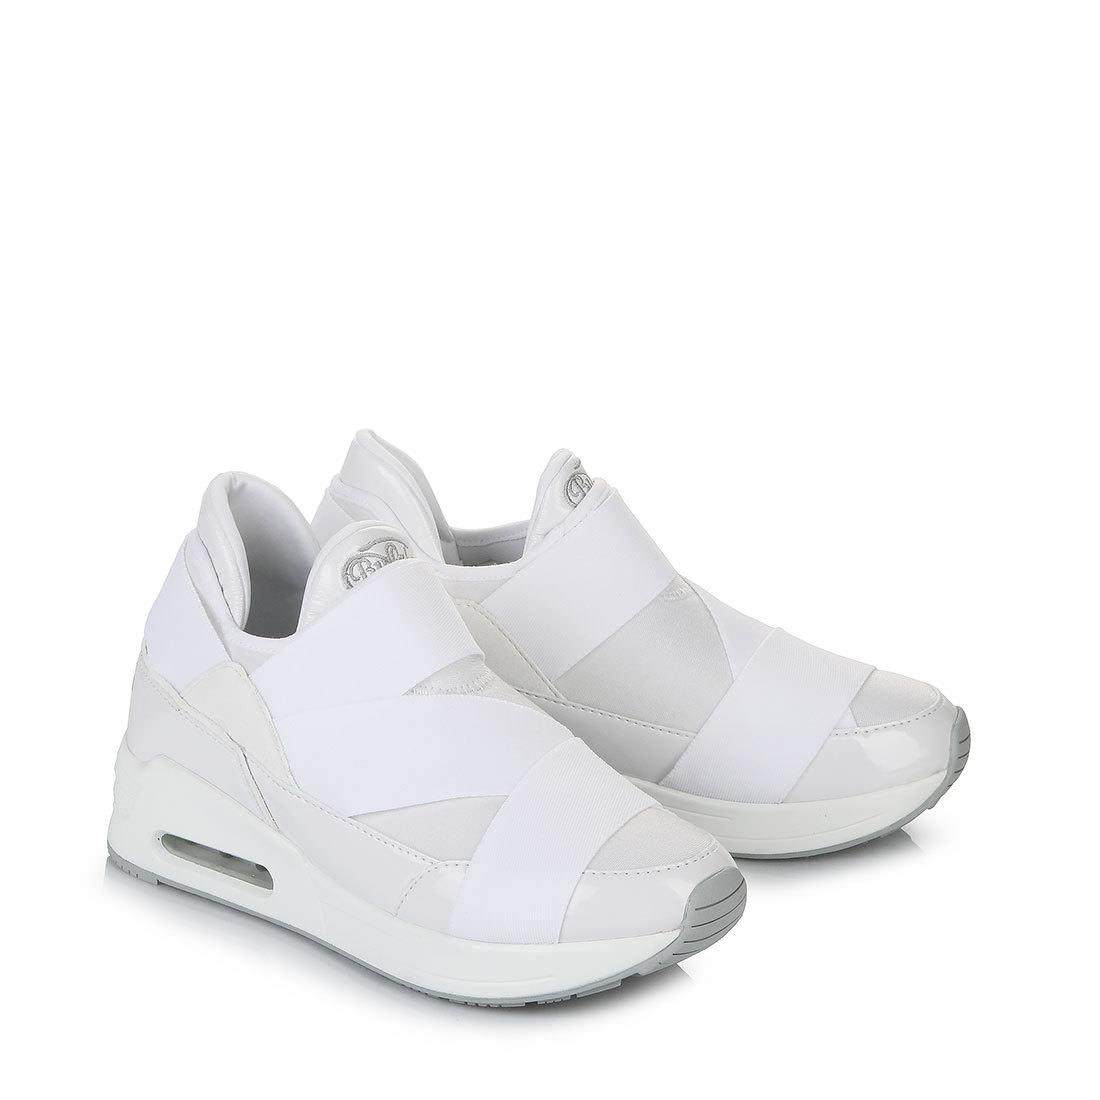 Dame 100-30 Néoprène Buffle Sneaker En Daim